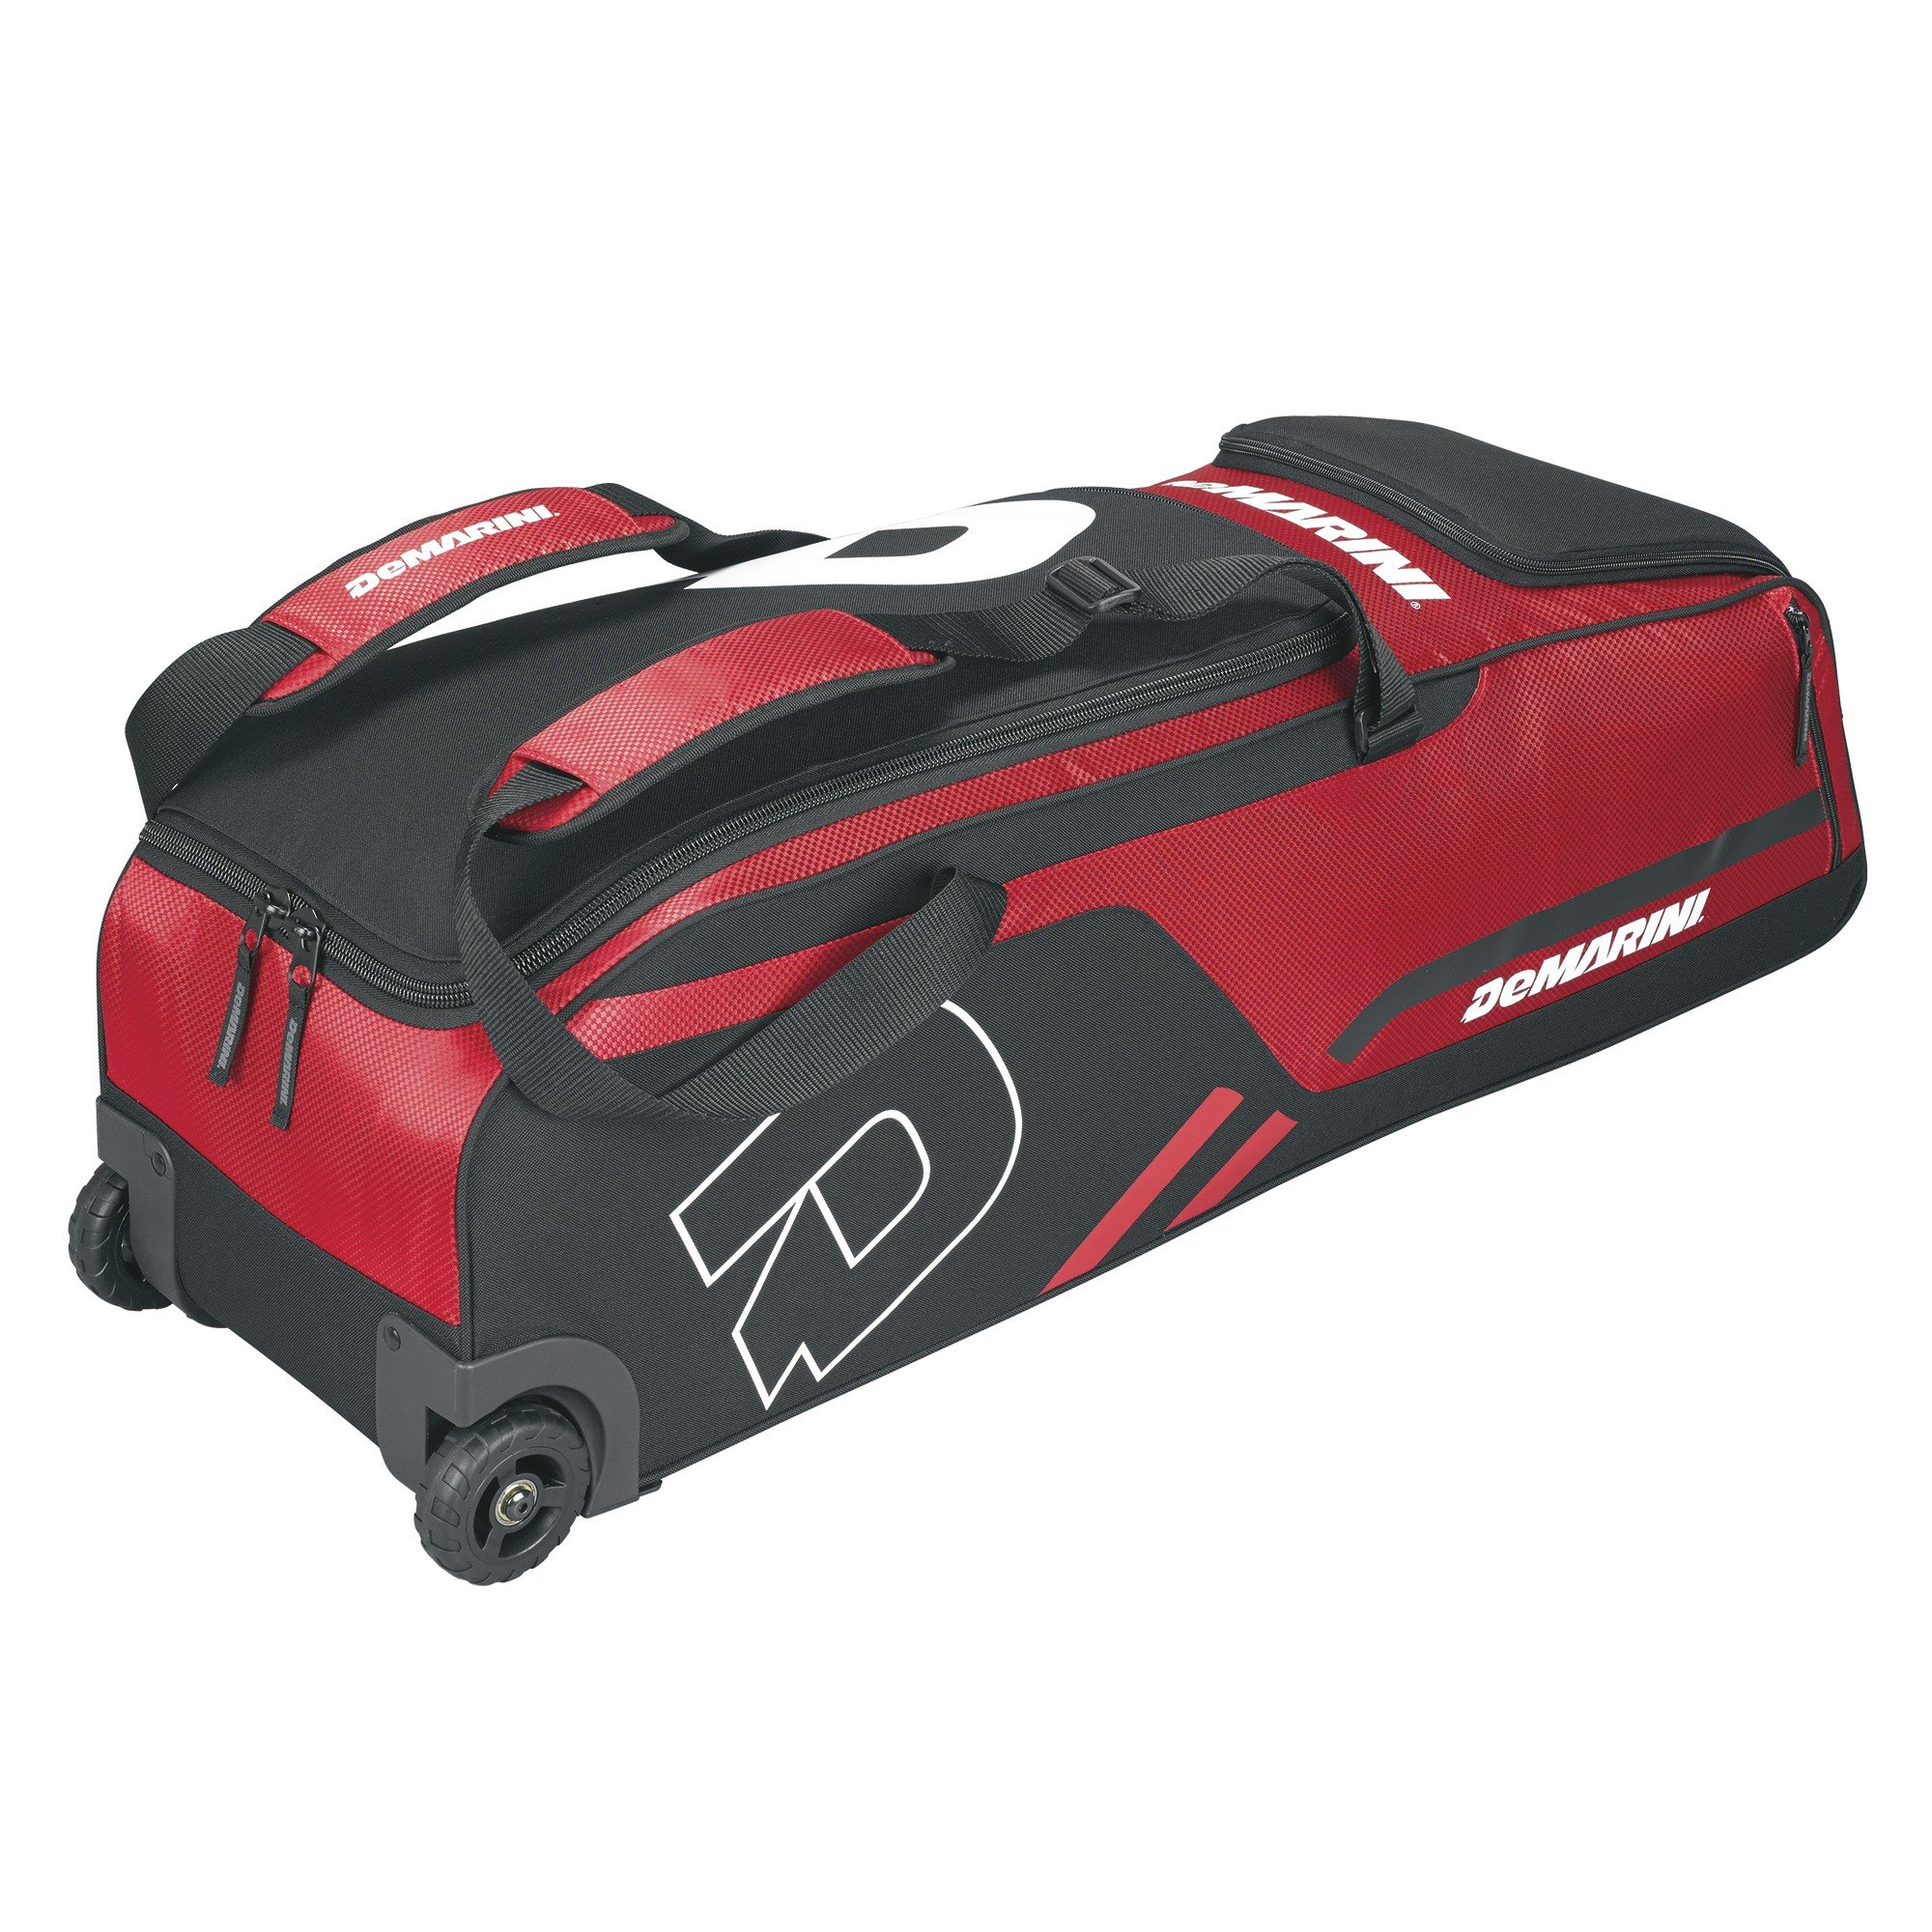 DeMarini Momentum Wheeled Bag, Scarlet by DeMarini